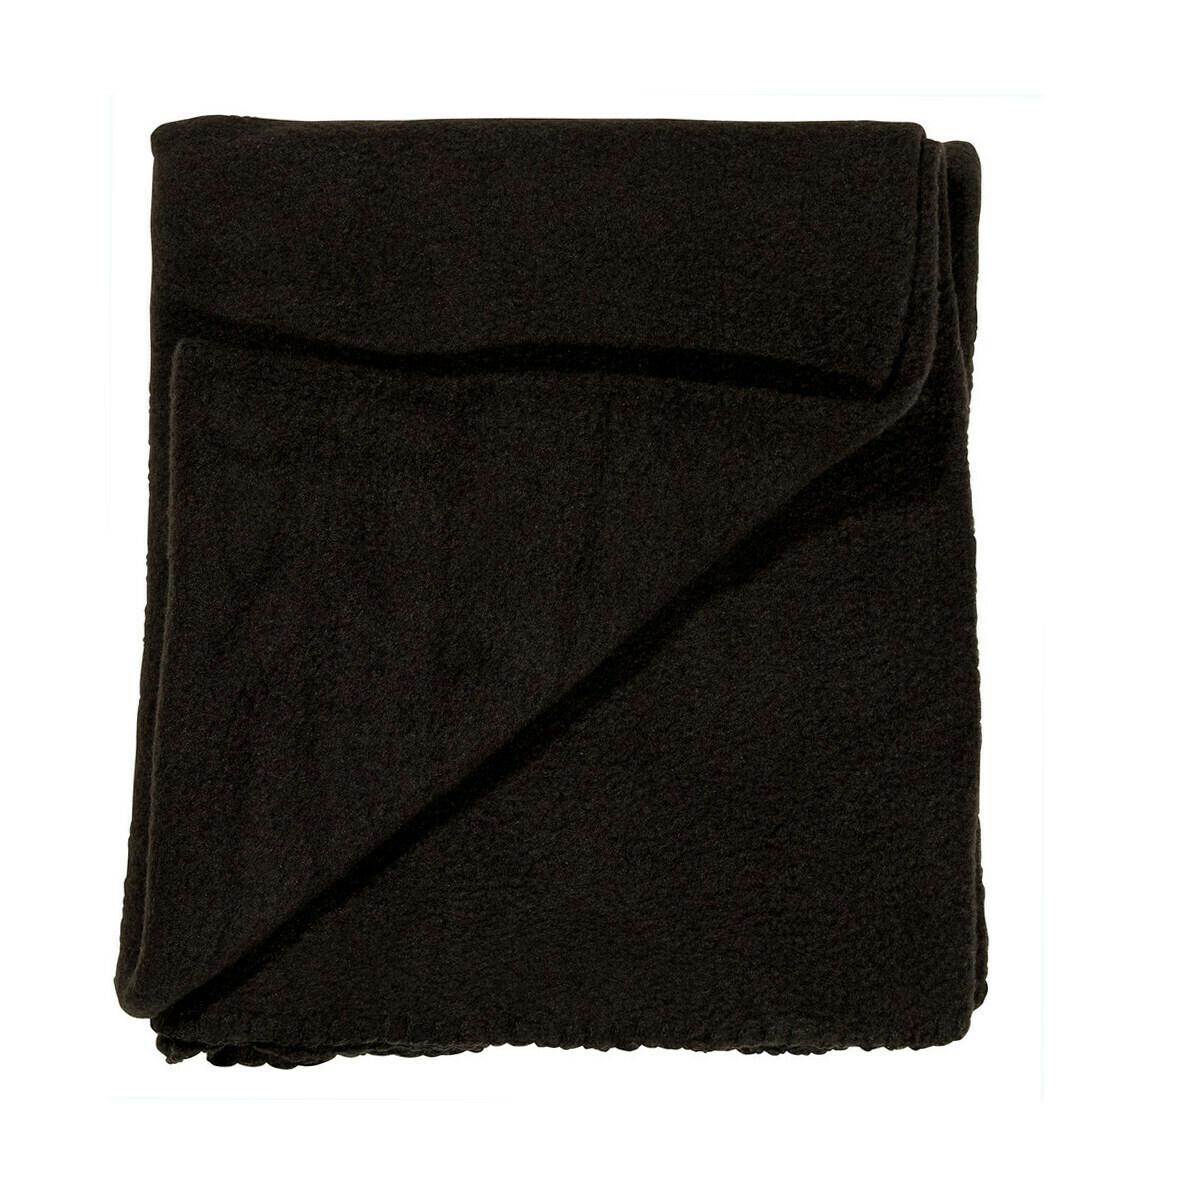 Throw - Black Fleece